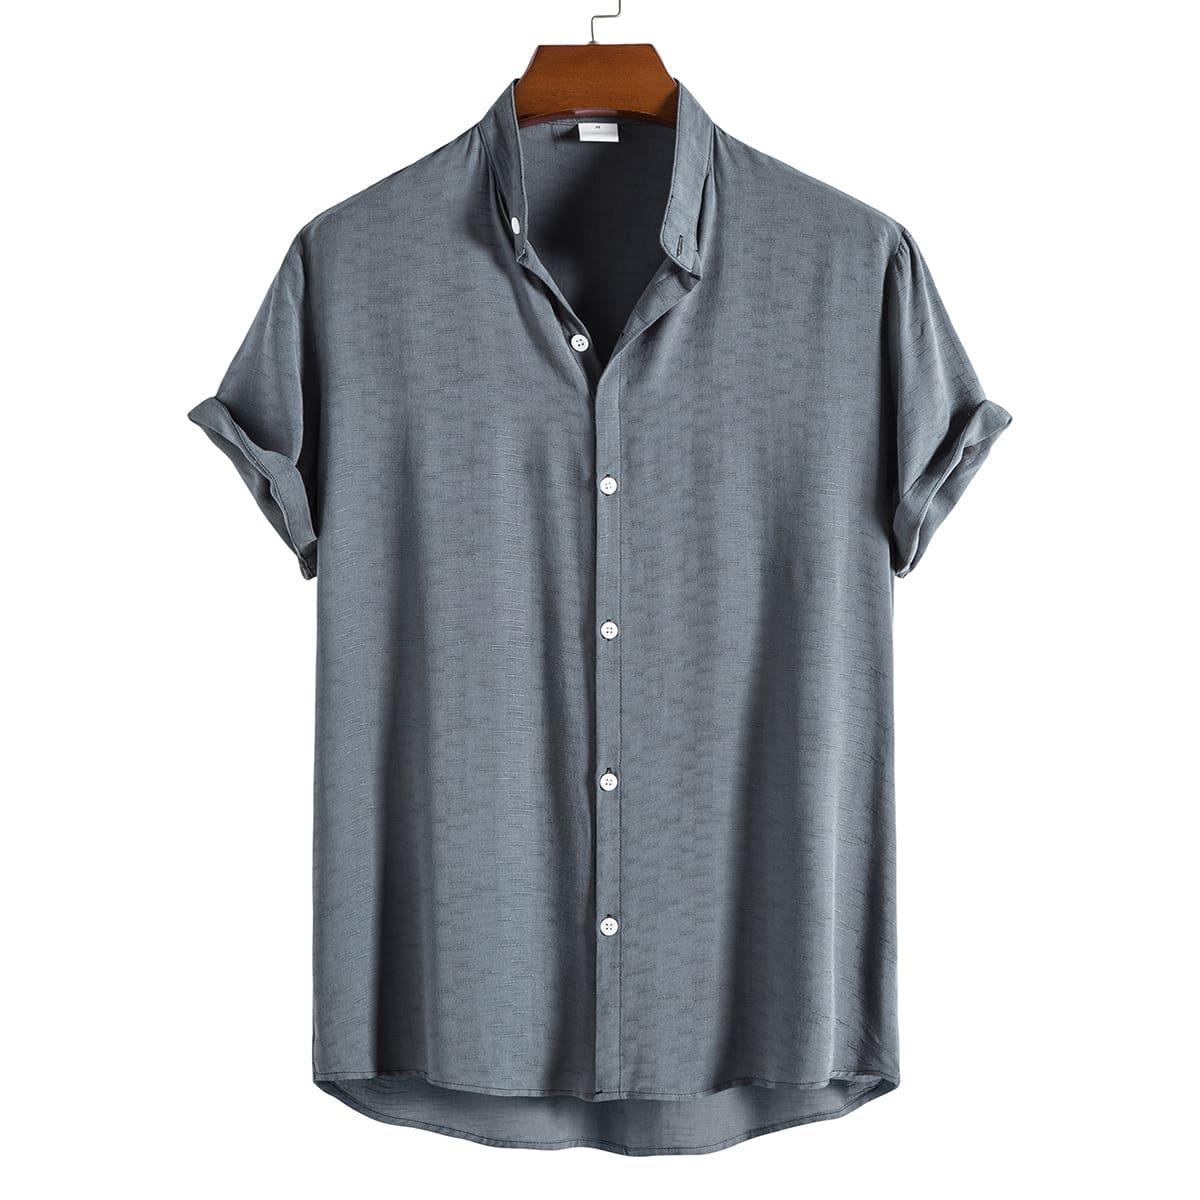 Рубашка на пуговицах для мужчины